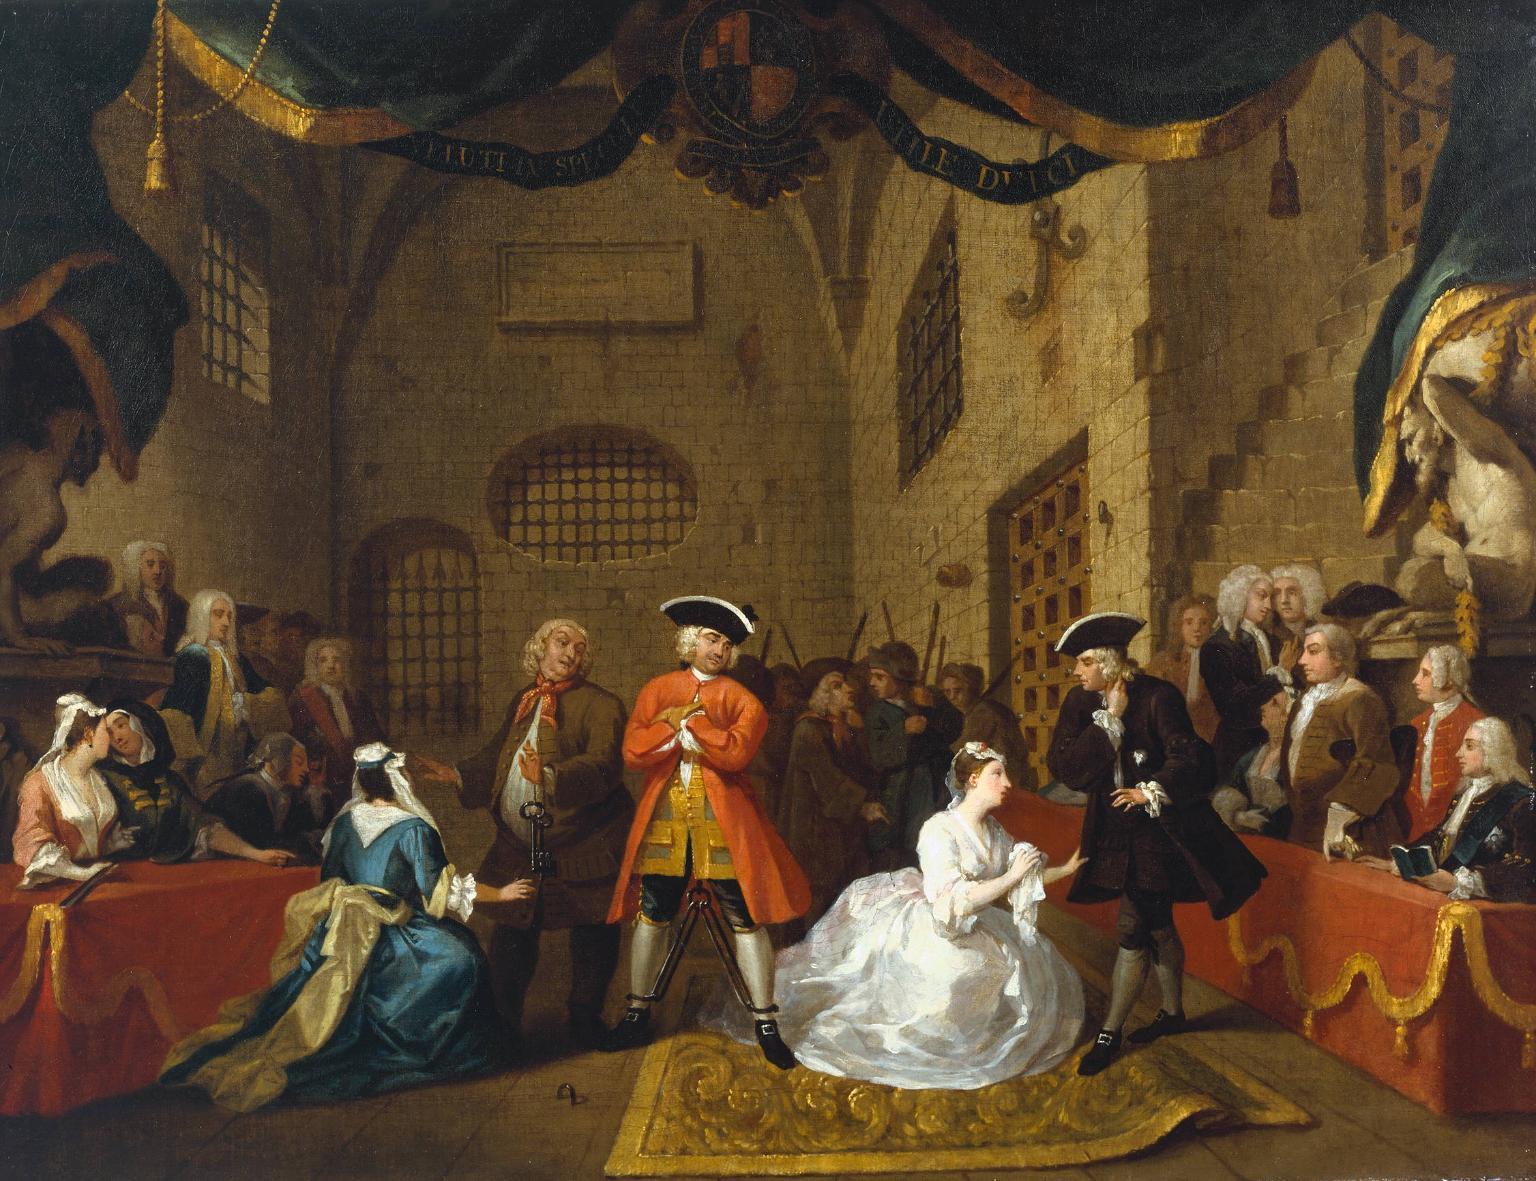 John Gay's Beggar's opera (Hogarth, 1728)